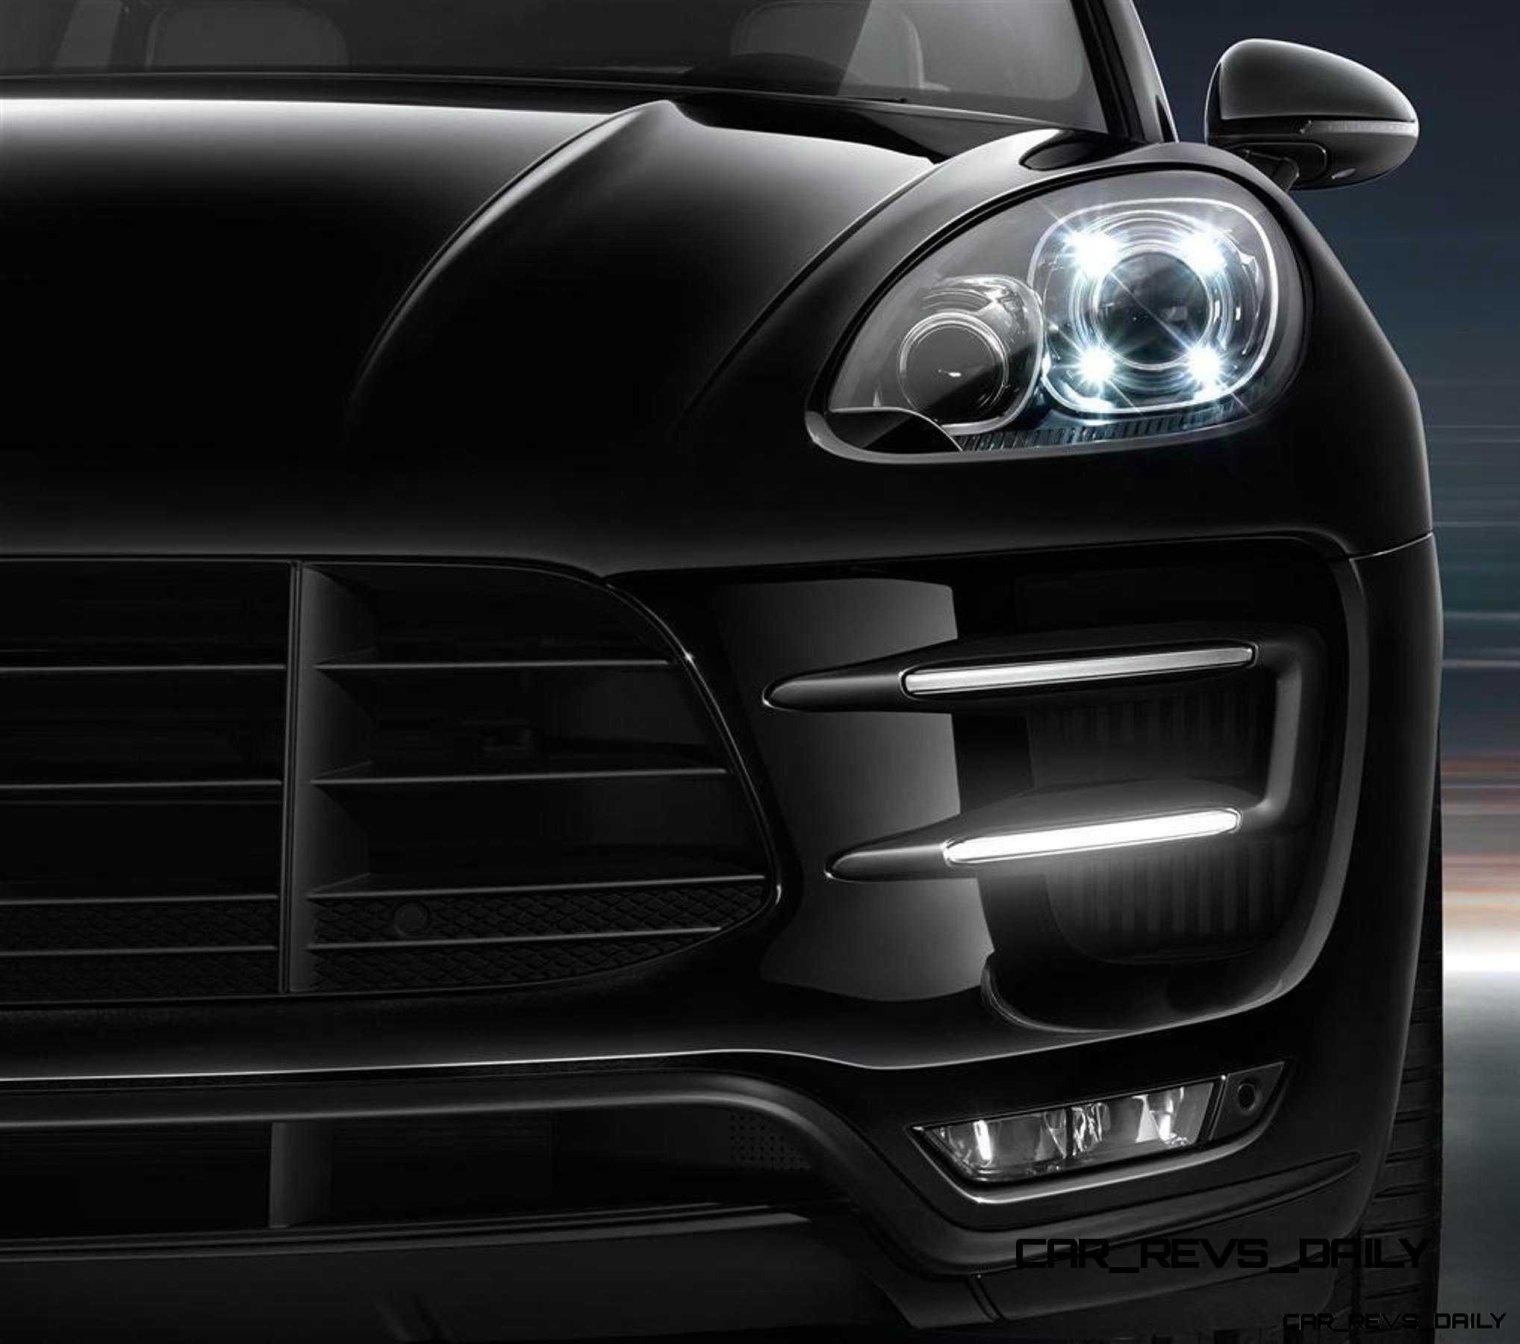 2015 Porsche Macan - Latest Images - CarRevsDaily.com 75